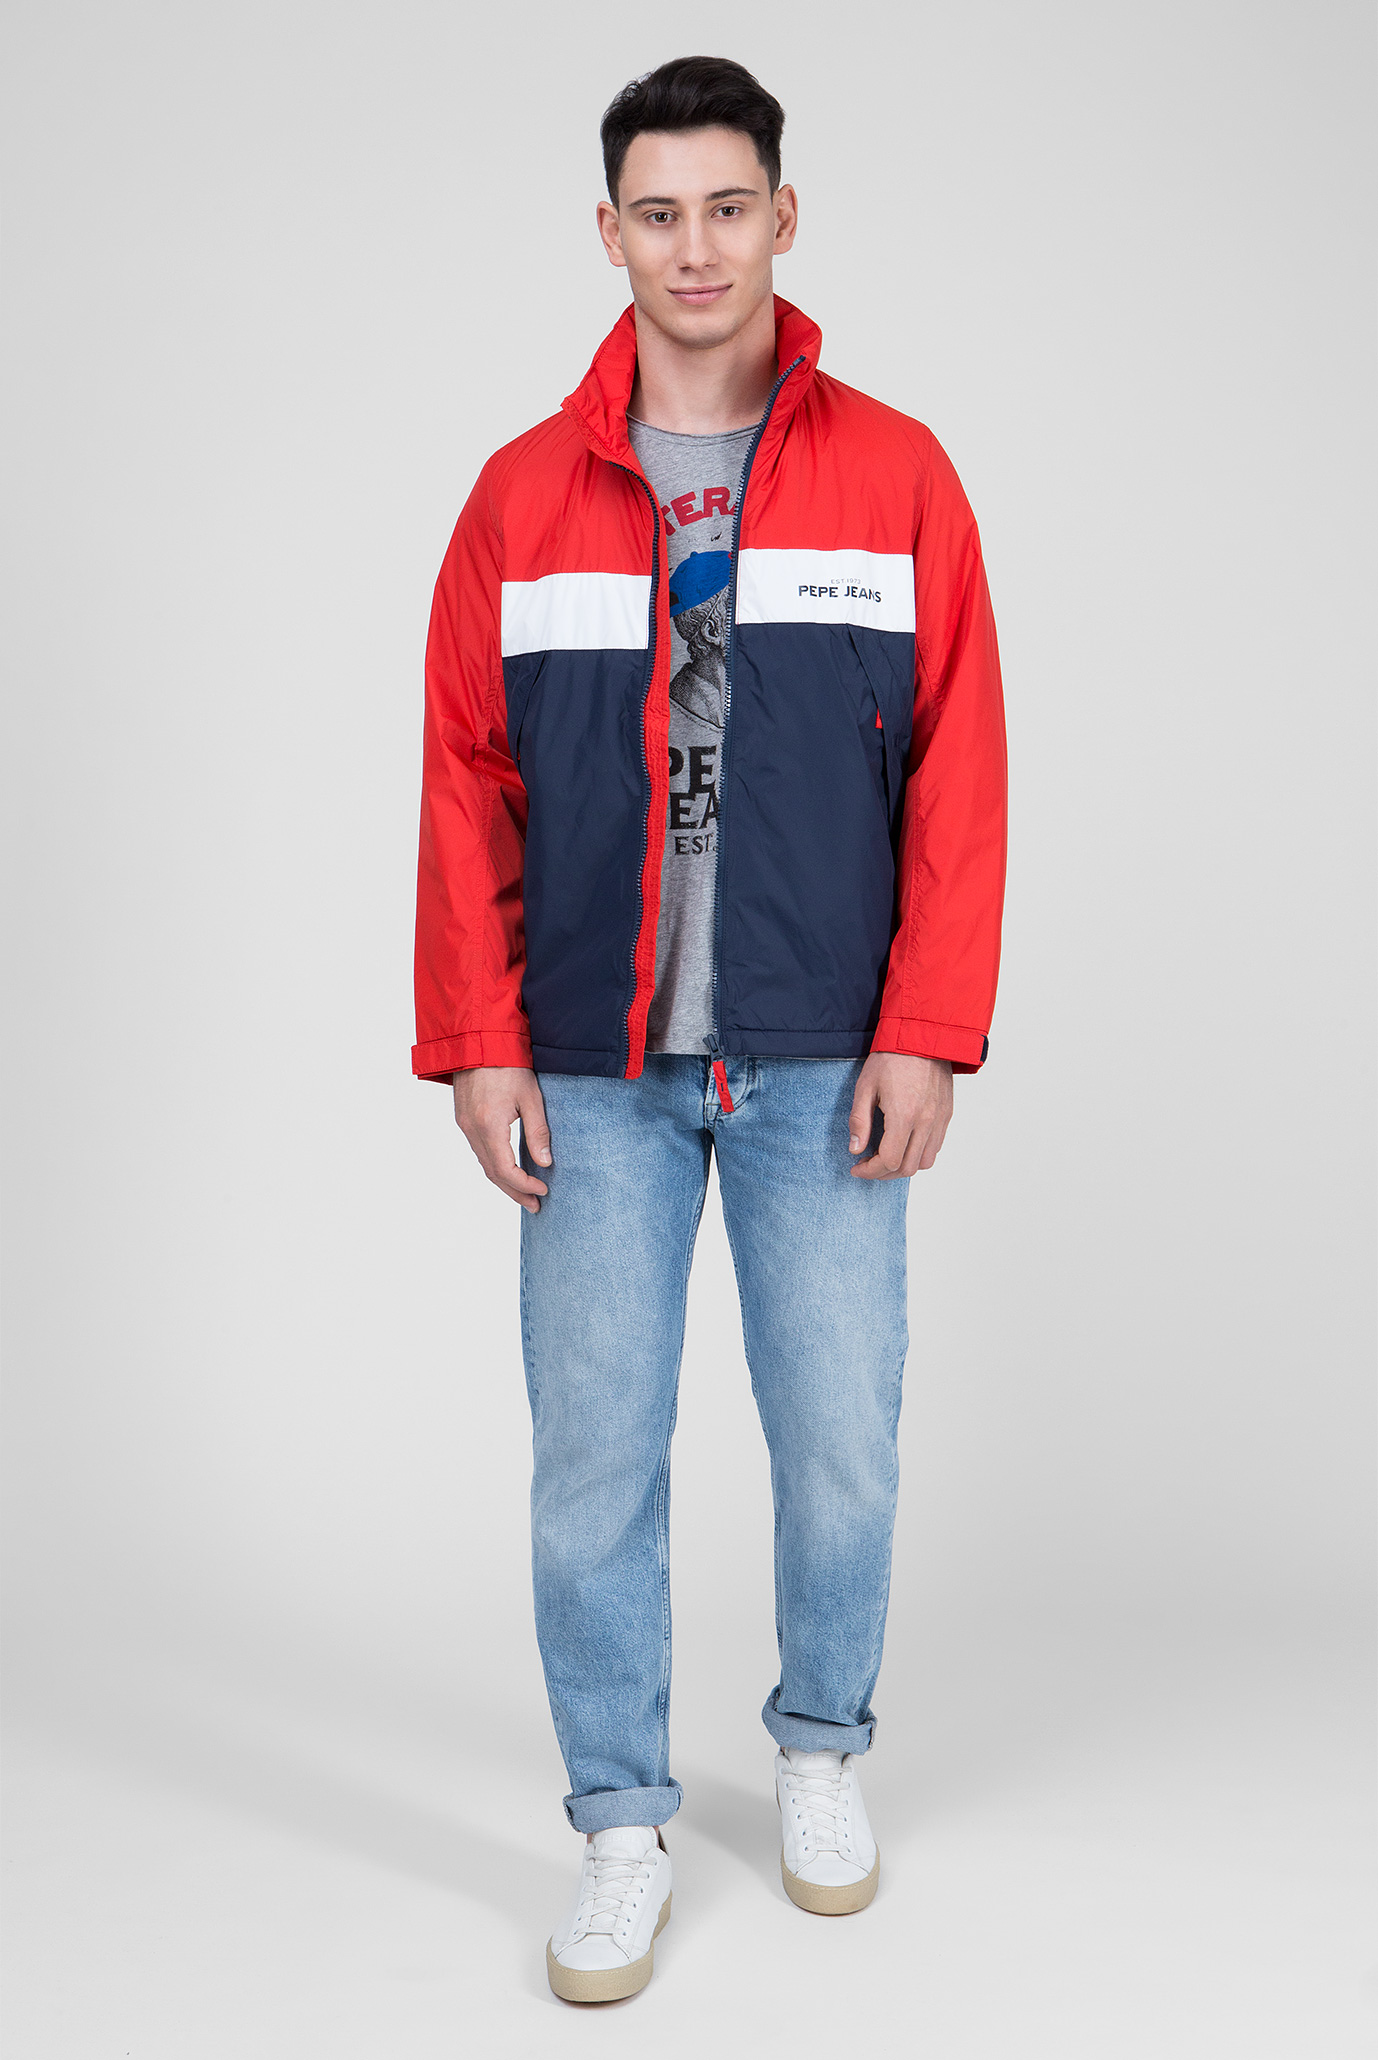 Купить Мужская красная куртка SAVAGE Pepe Jeans Pepe Jeans PM401921 – Киев, Украина. Цены в интернет магазине MD Fashion